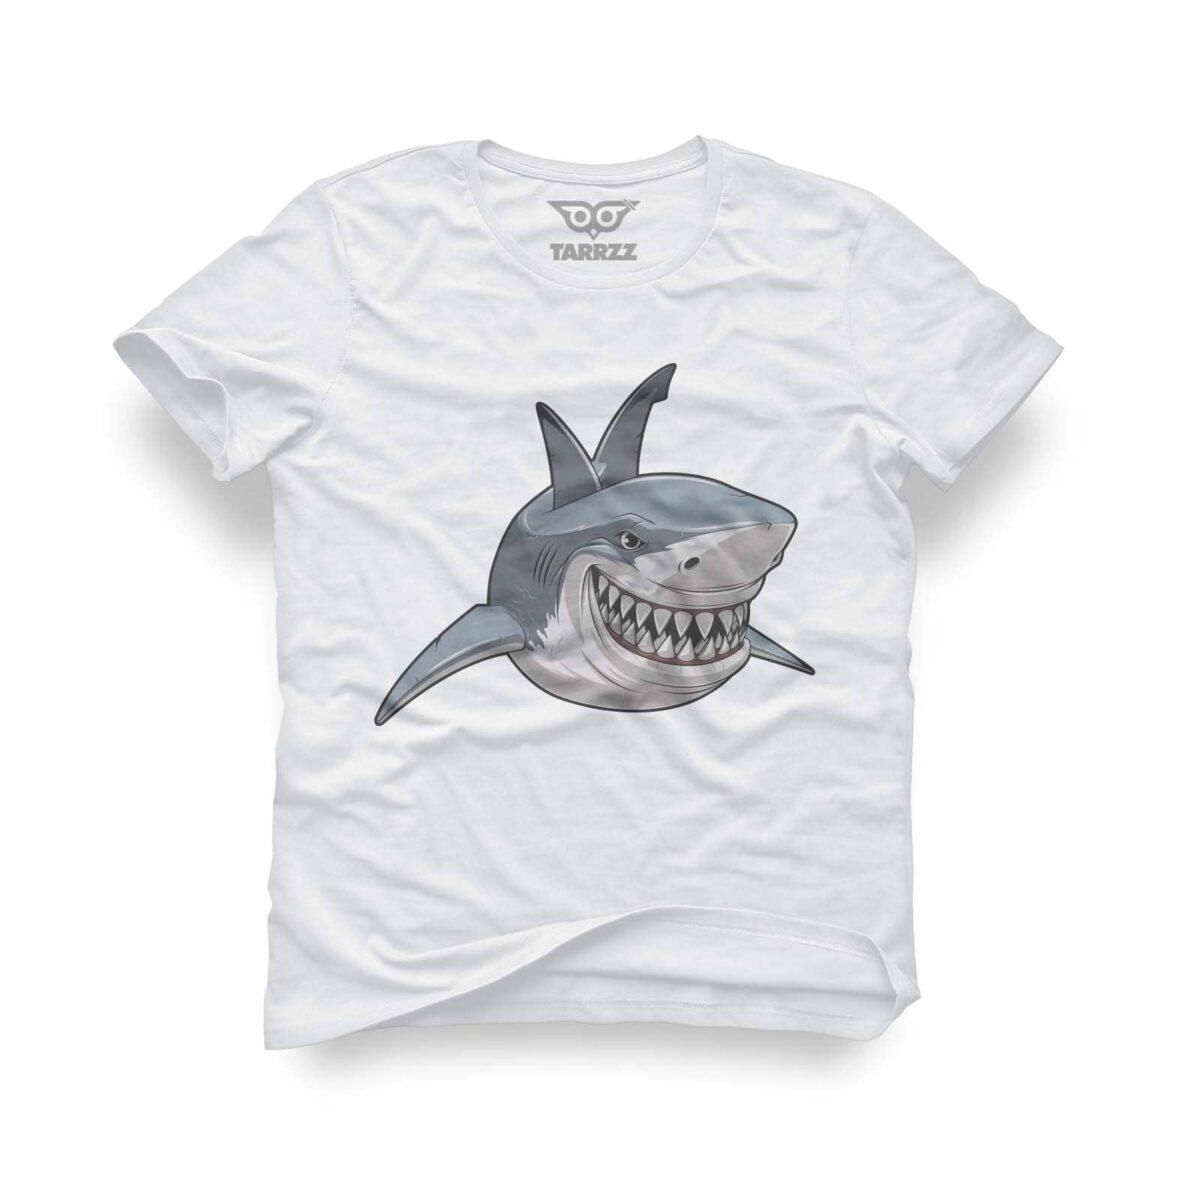 tarrzz-tasarim-beyaz-tisort-kopekbaligi-smile-like-a-shark